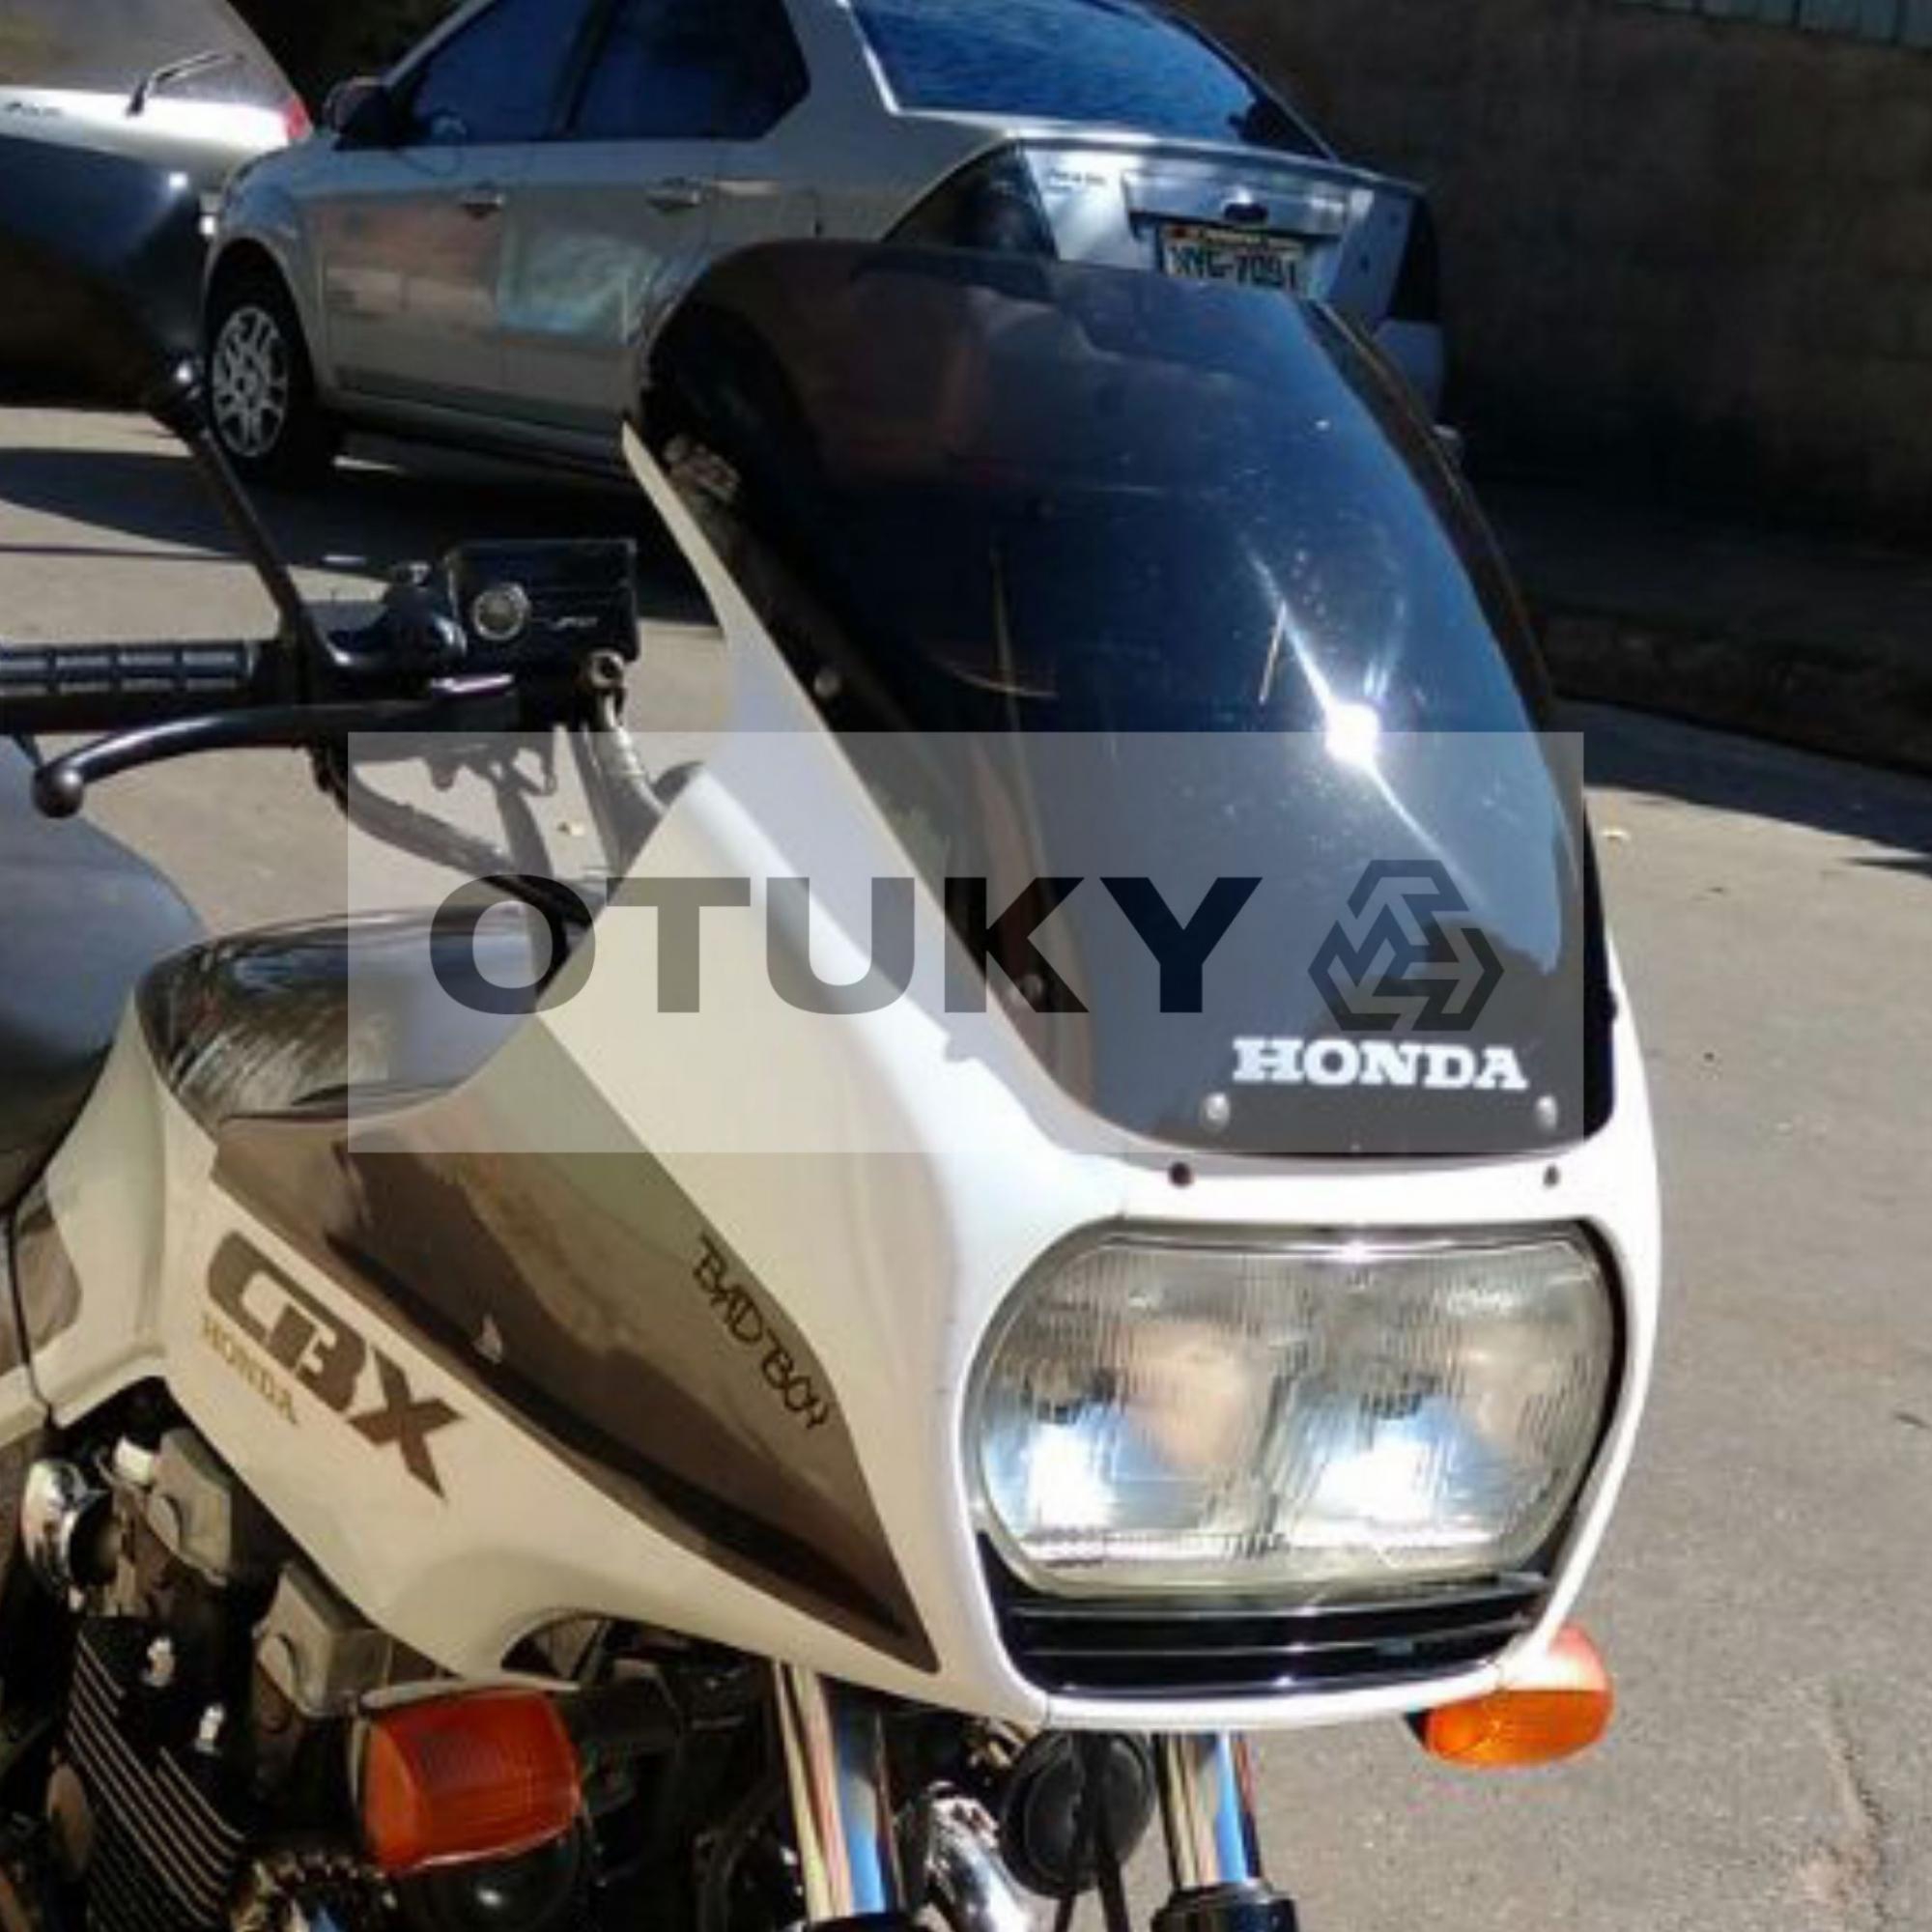 Bolha para Moto CBX 750 F Galo 1987 1988 1989 1990 Fumê Escuro